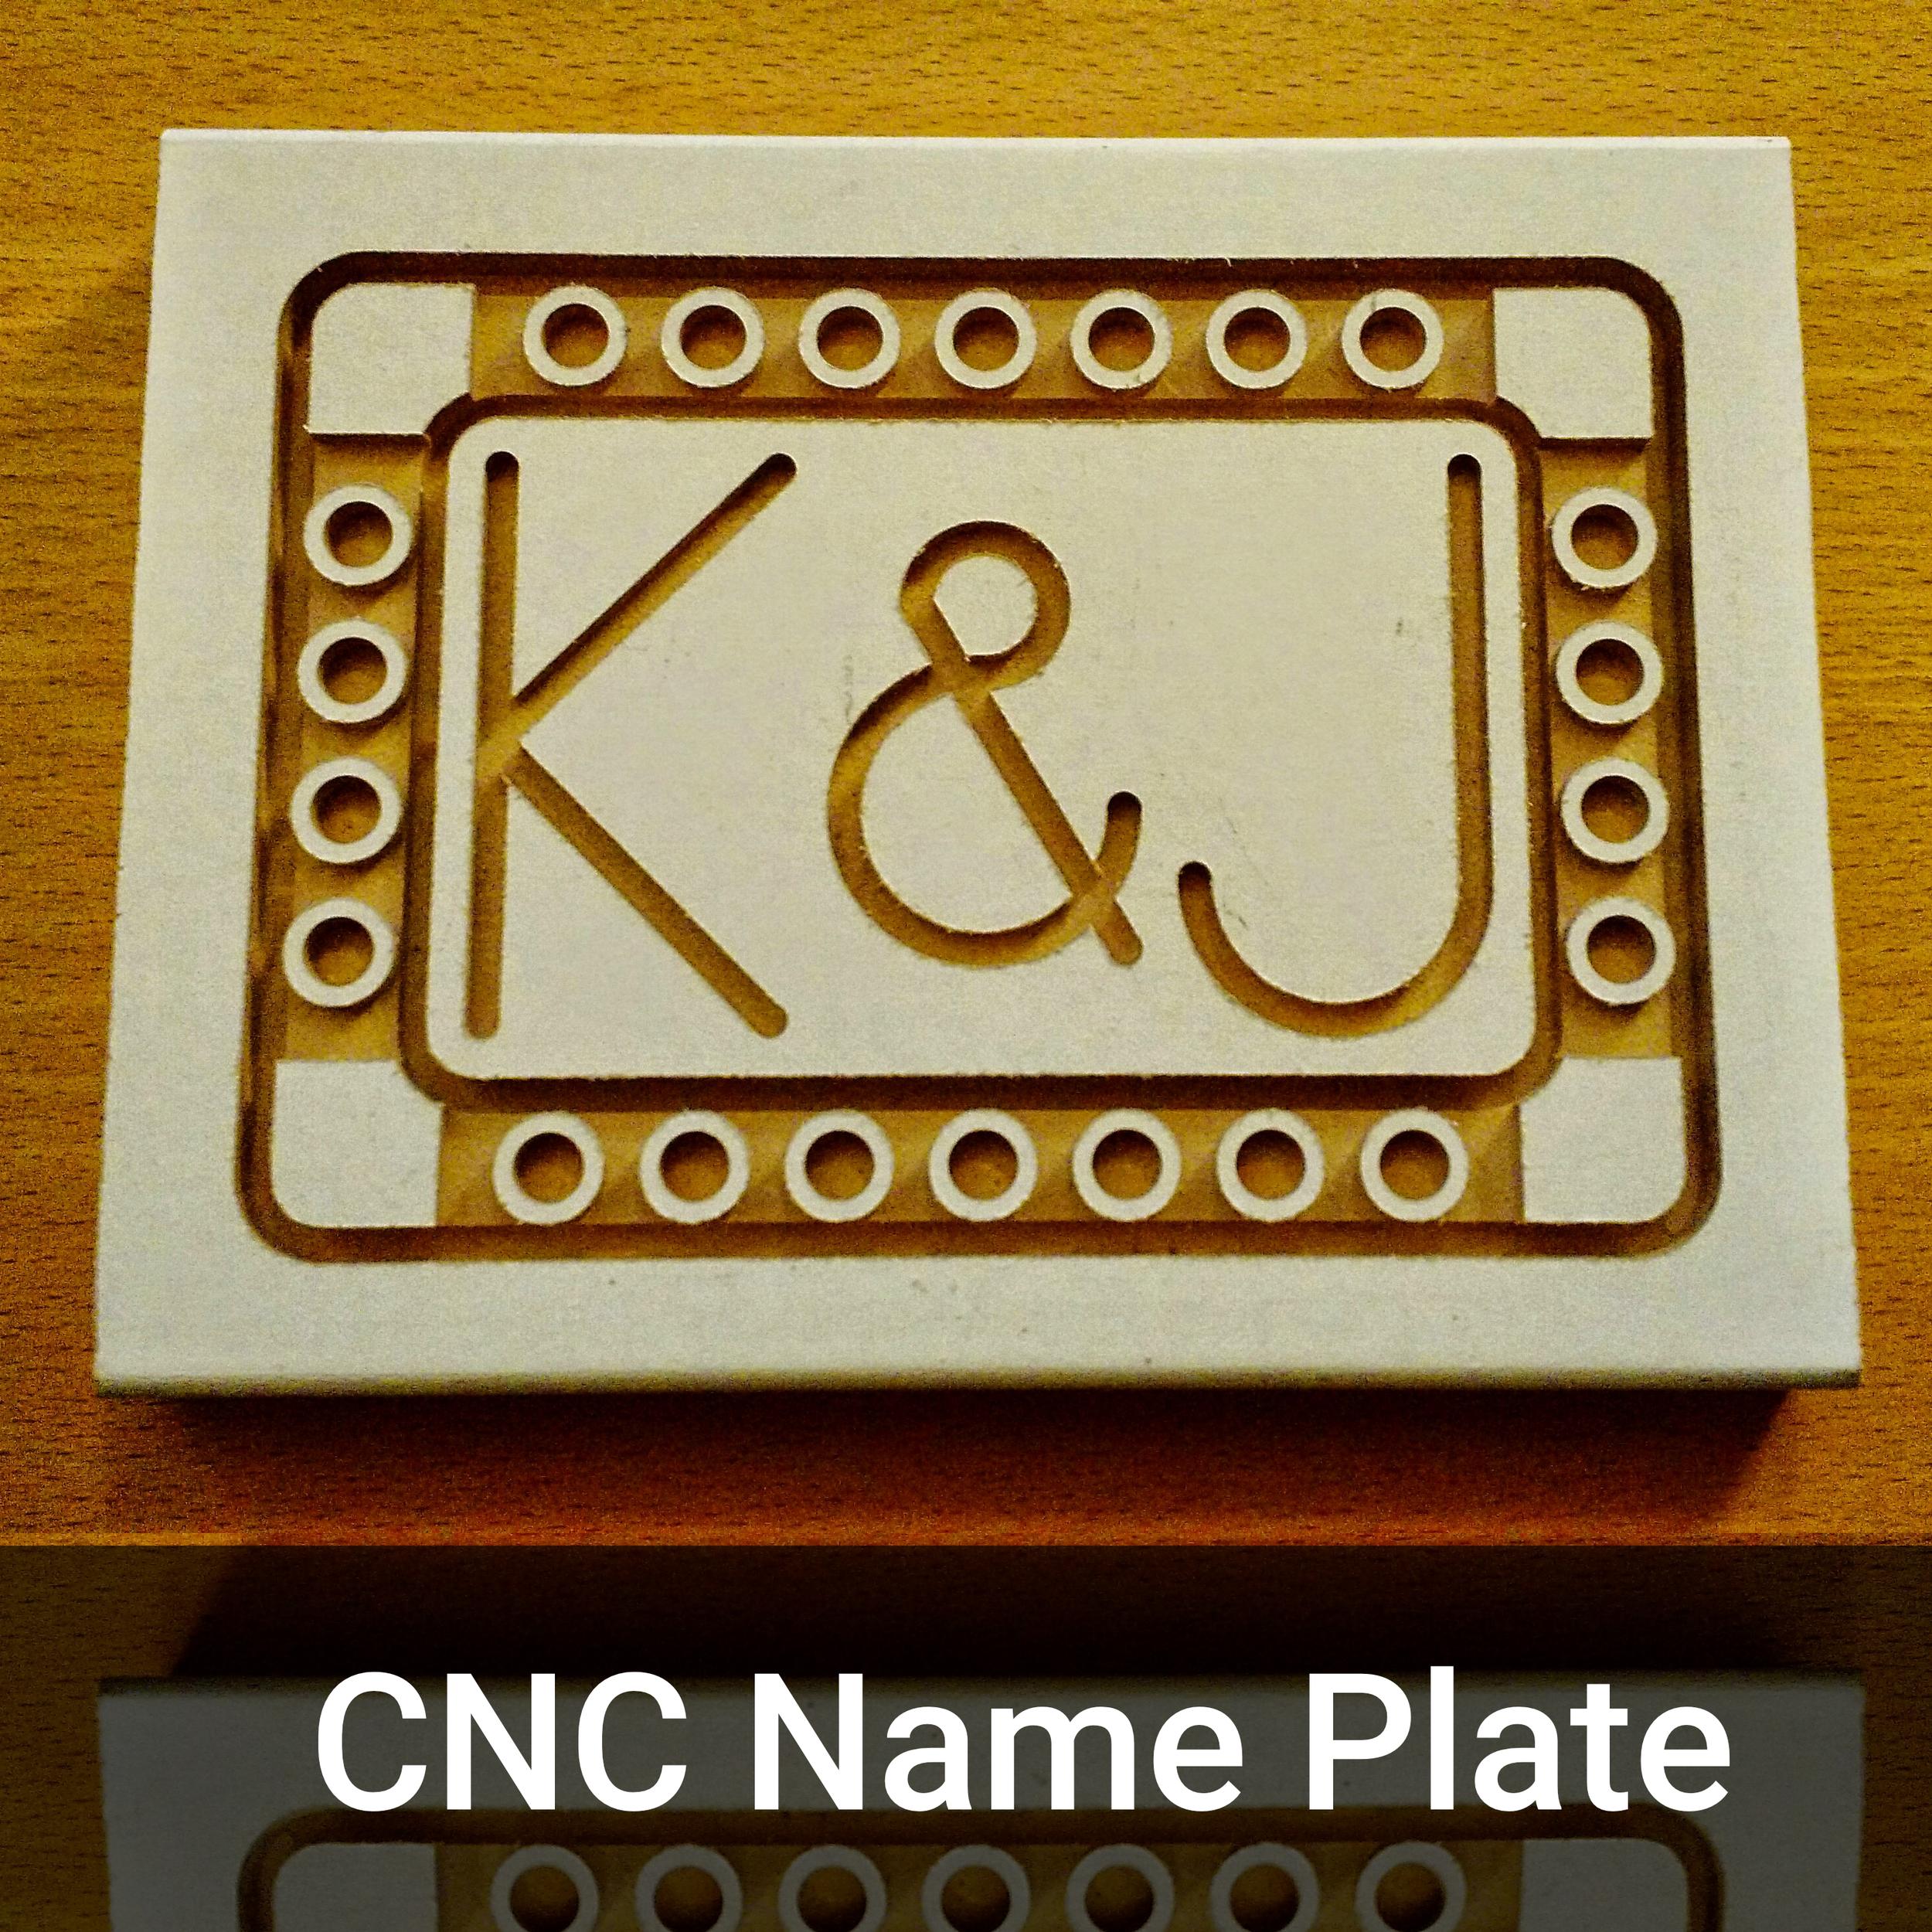 CNCNamePlate - Square - Label.png